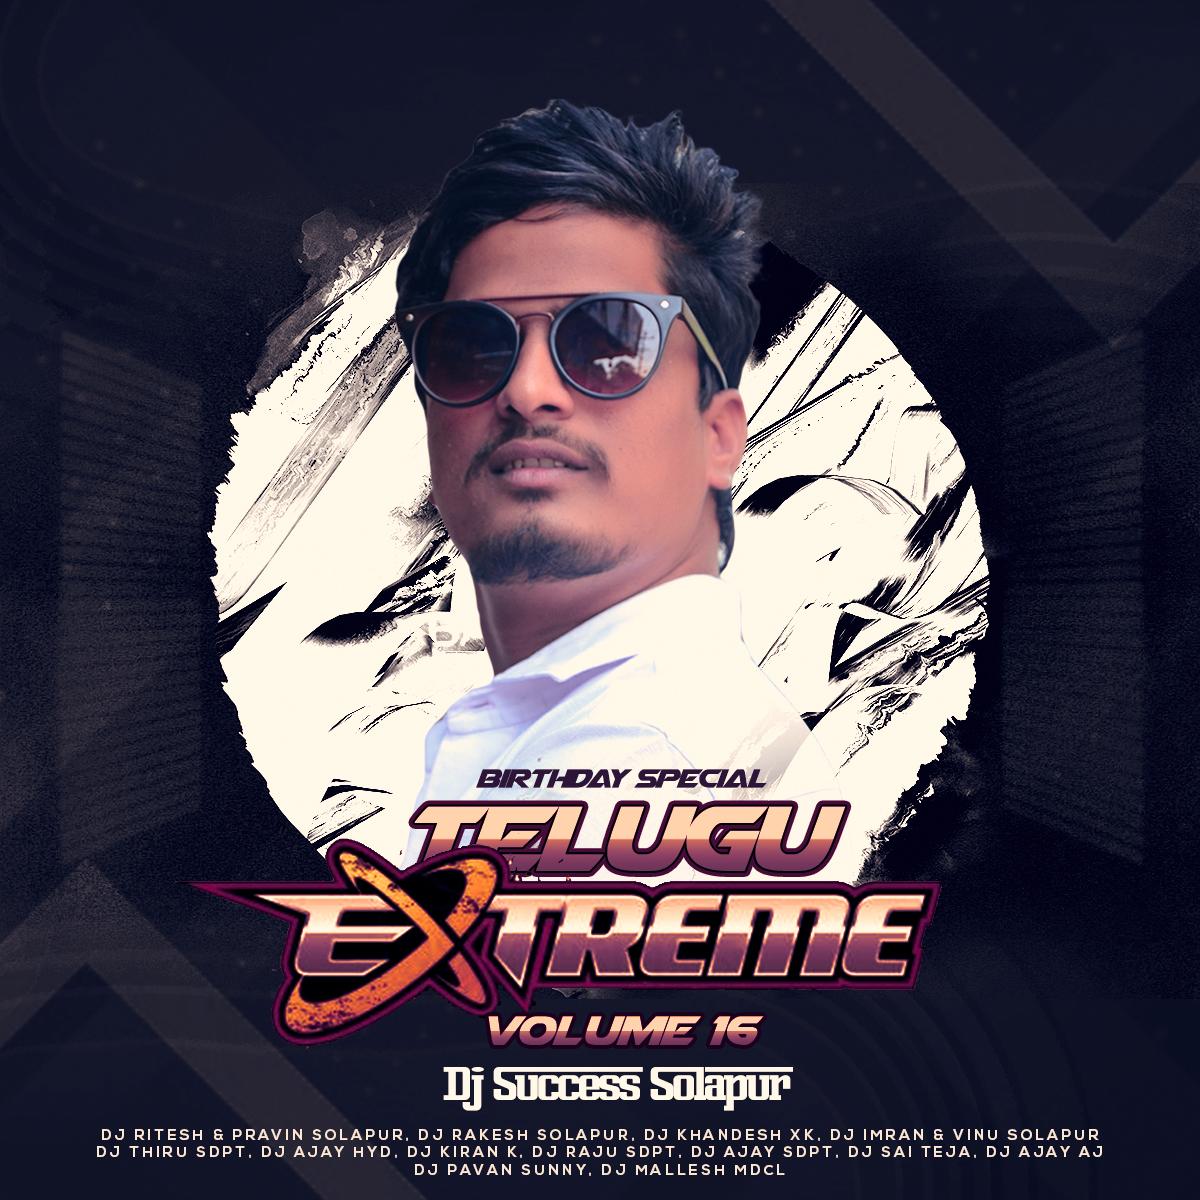 Telugu Extreme Vol.16 (Dj Success Solapur Birthday Special)